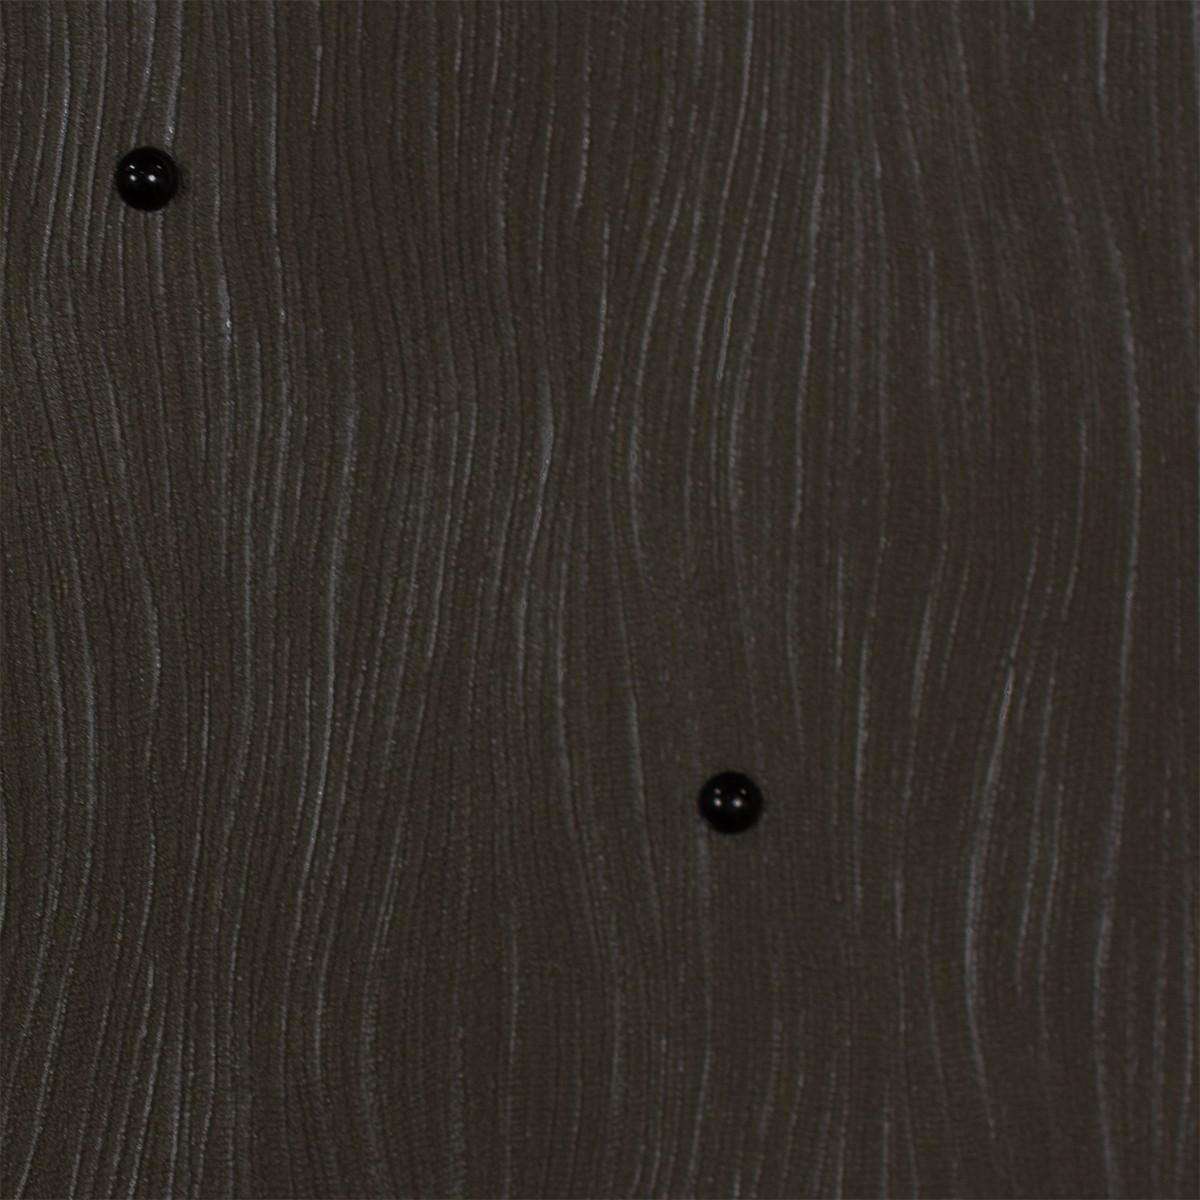 luigi colani visions vliestapete marburg tapete 53375 uni. Black Bedroom Furniture Sets. Home Design Ideas